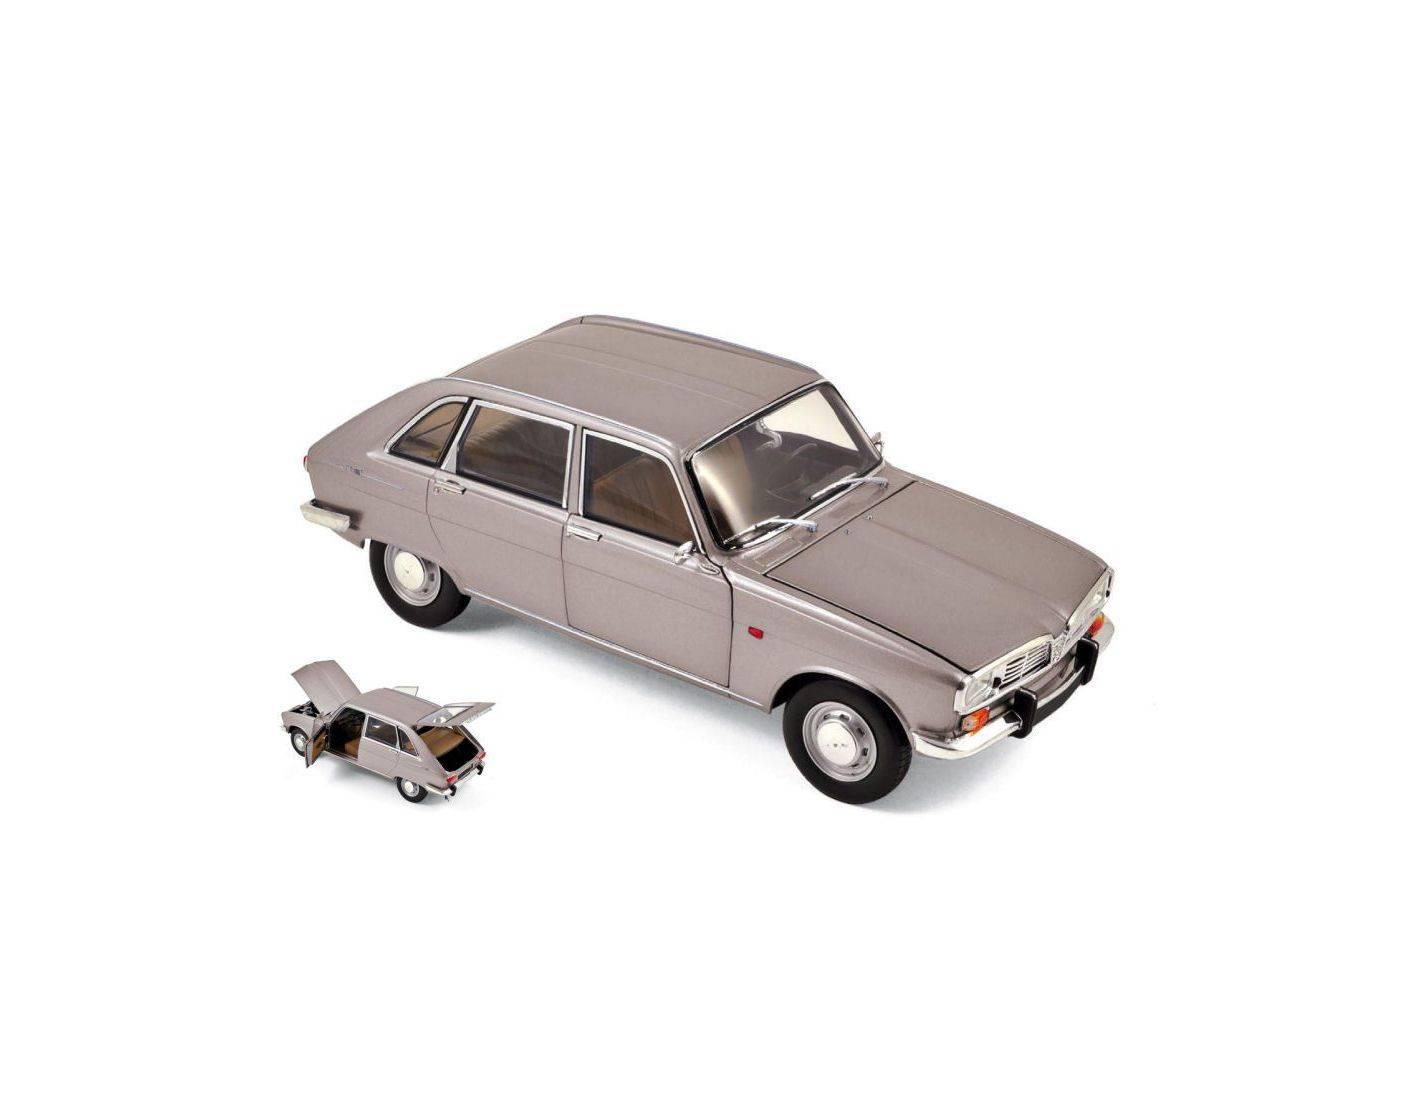 auto 1 18 norev nv185133 renault 16 1968 grey metallic 1 18 modellino modellino shop. Black Bedroom Furniture Sets. Home Design Ideas